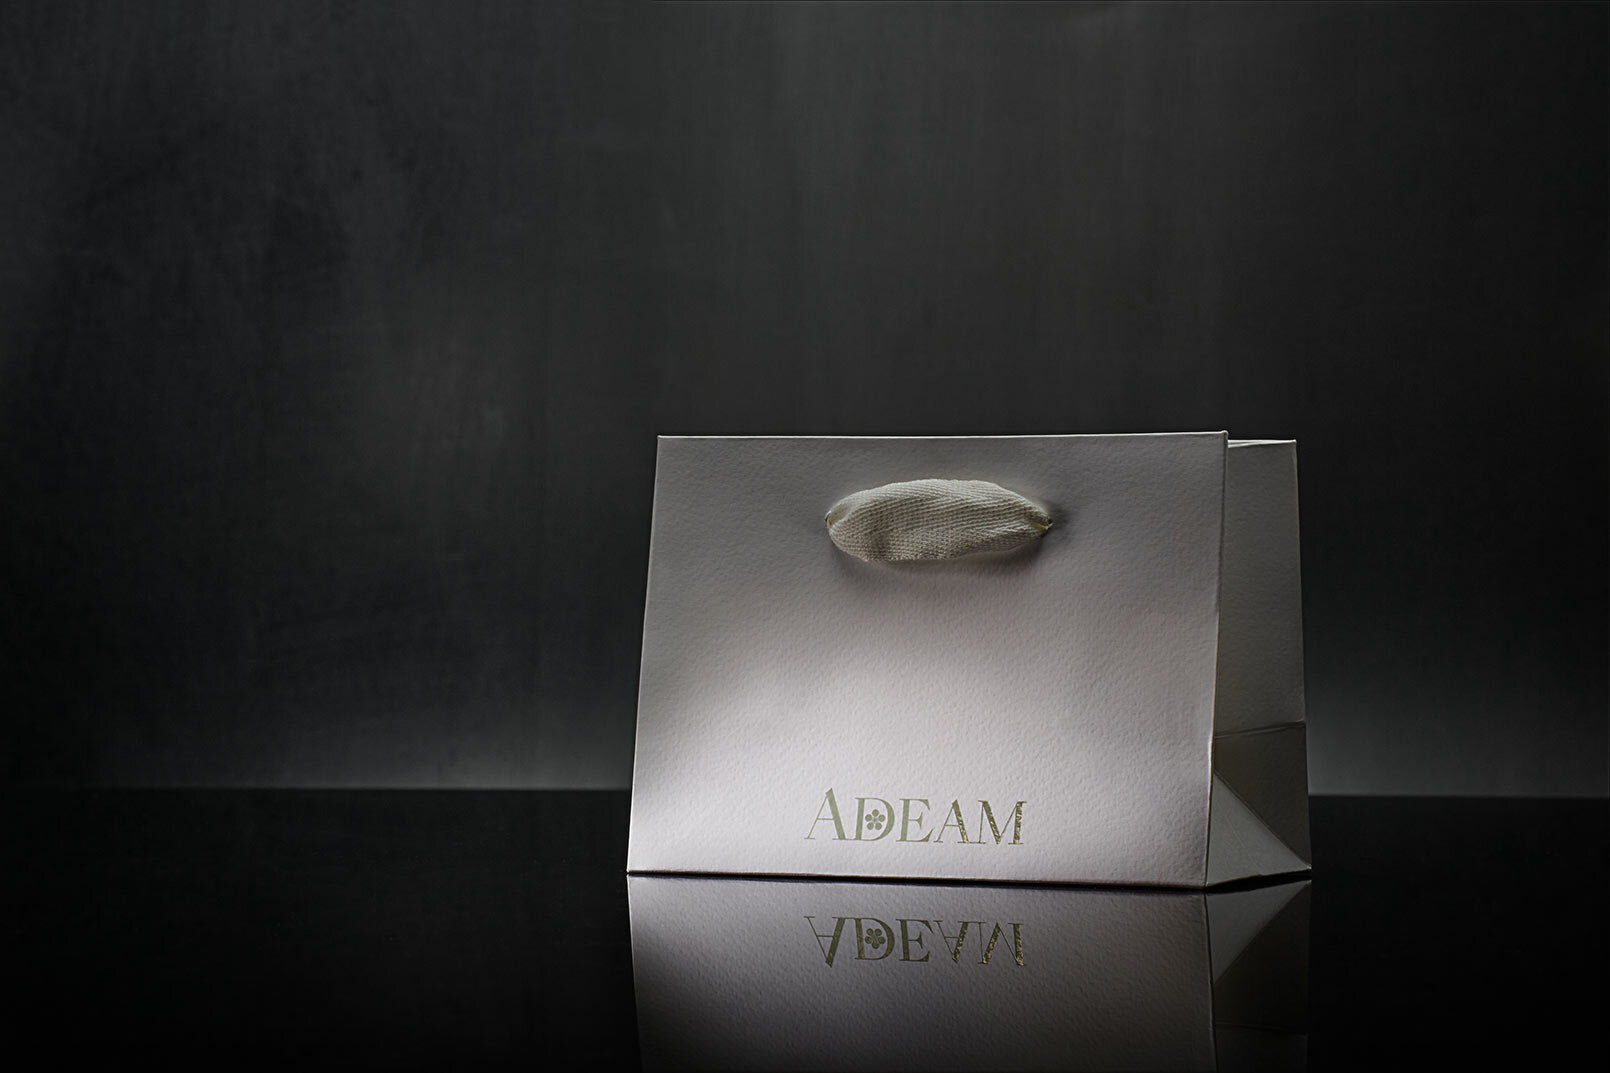 Adeam-Shopping-Bag-Design-Packaging-Company-1.1.jpg